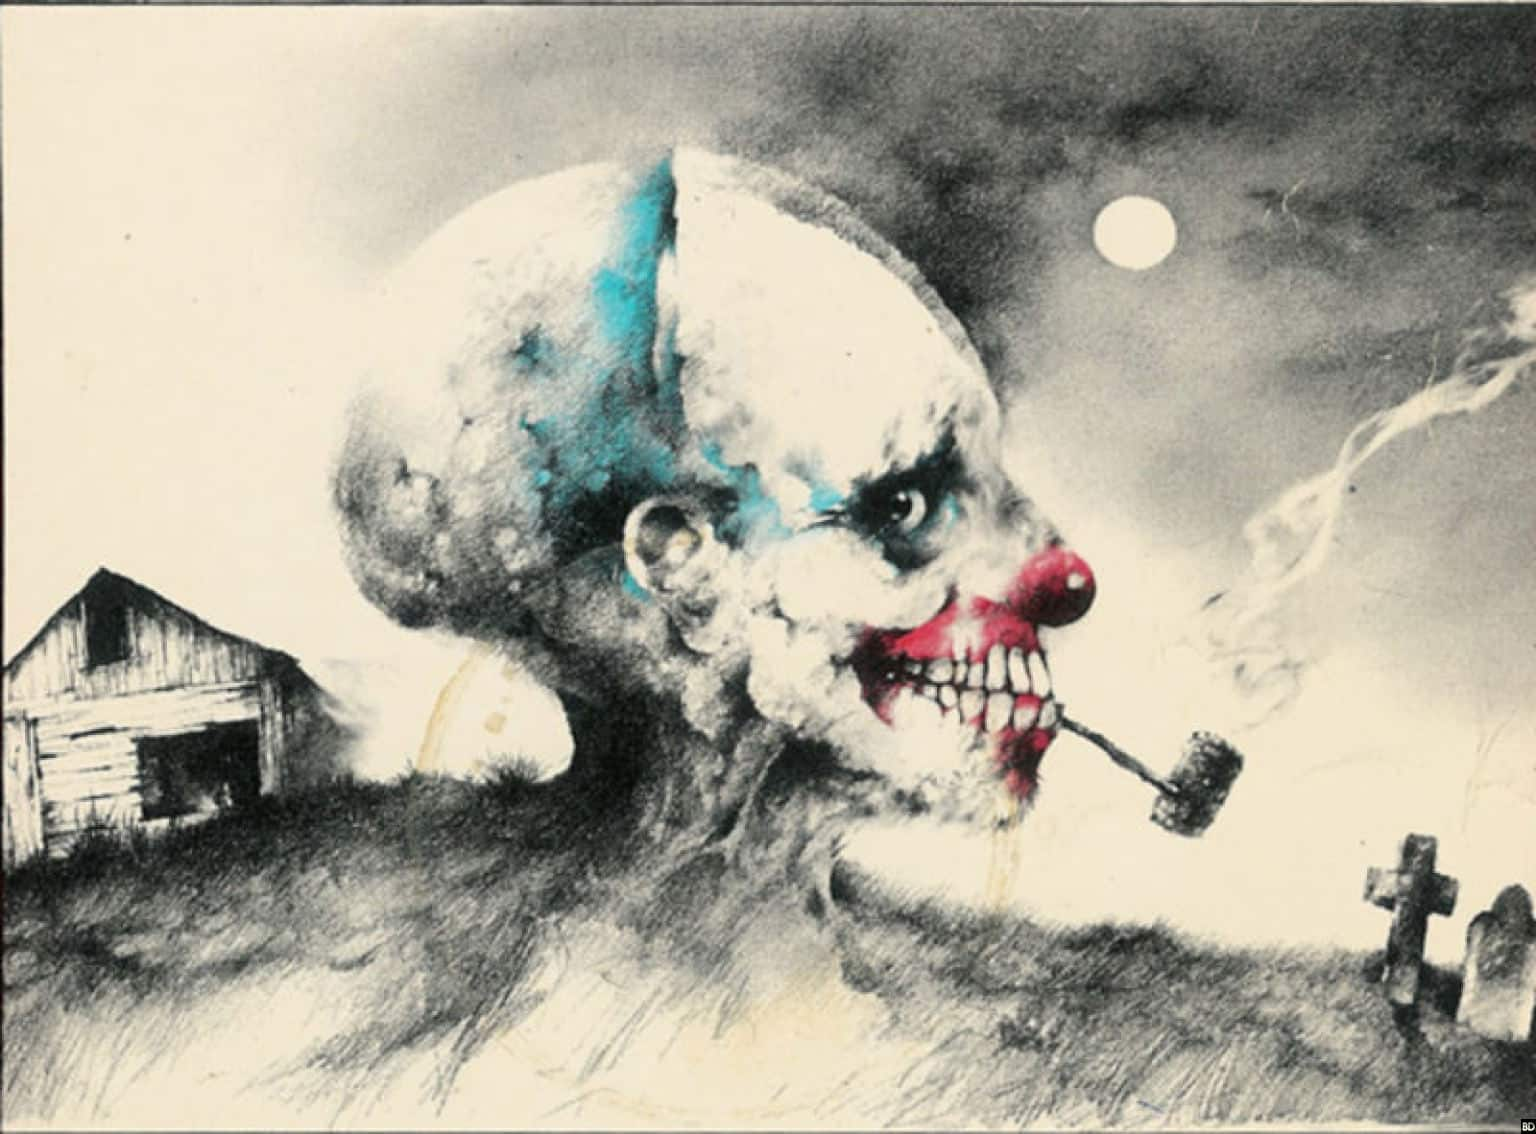 Scary Stories to Tell in the Dark confirma lanzamiento para 2019 con CBS y Lionsgate